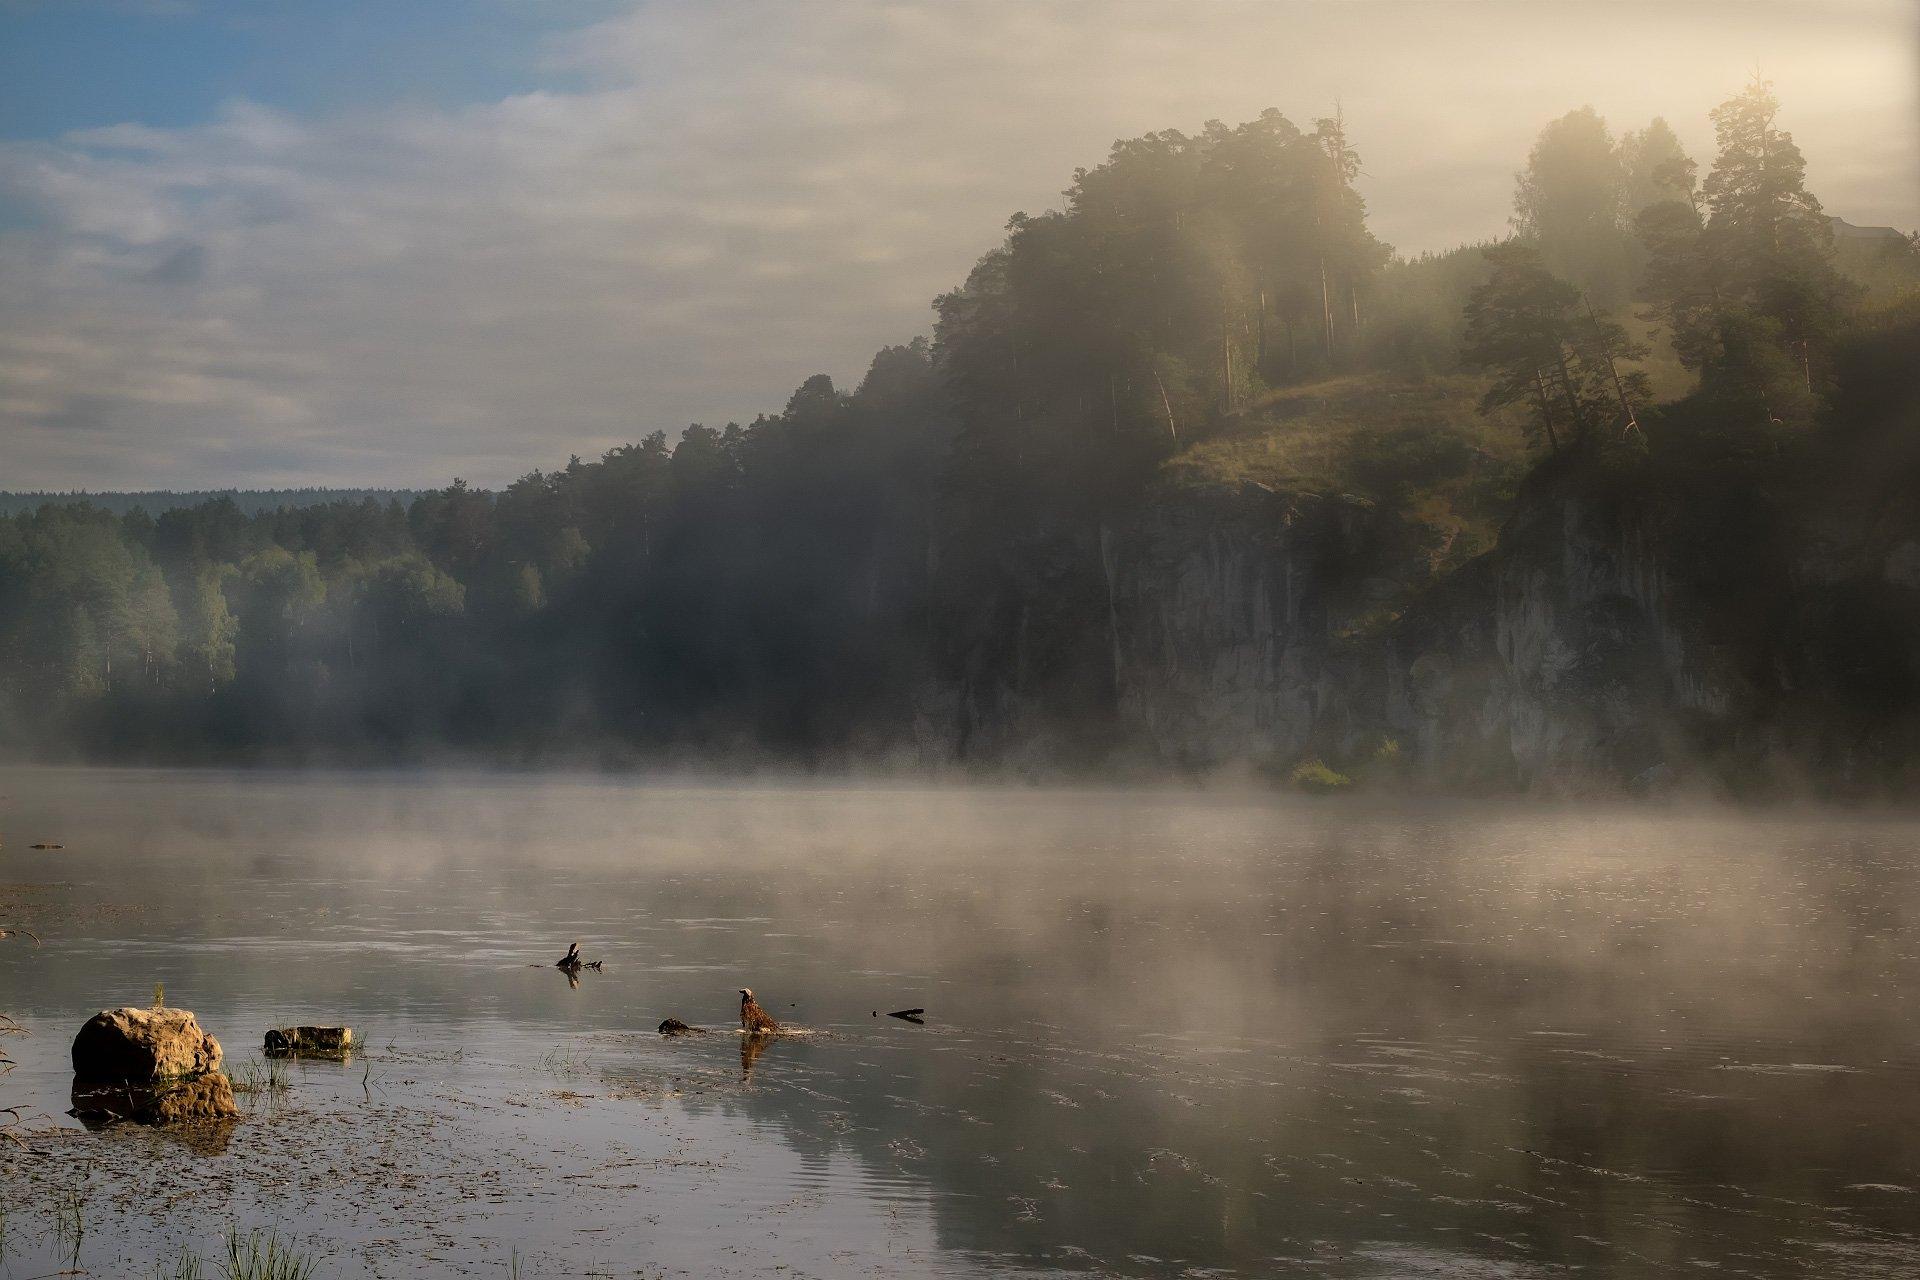 пейзаж, урал, ай, река, утро, туман, скалы, Андрей Чиж